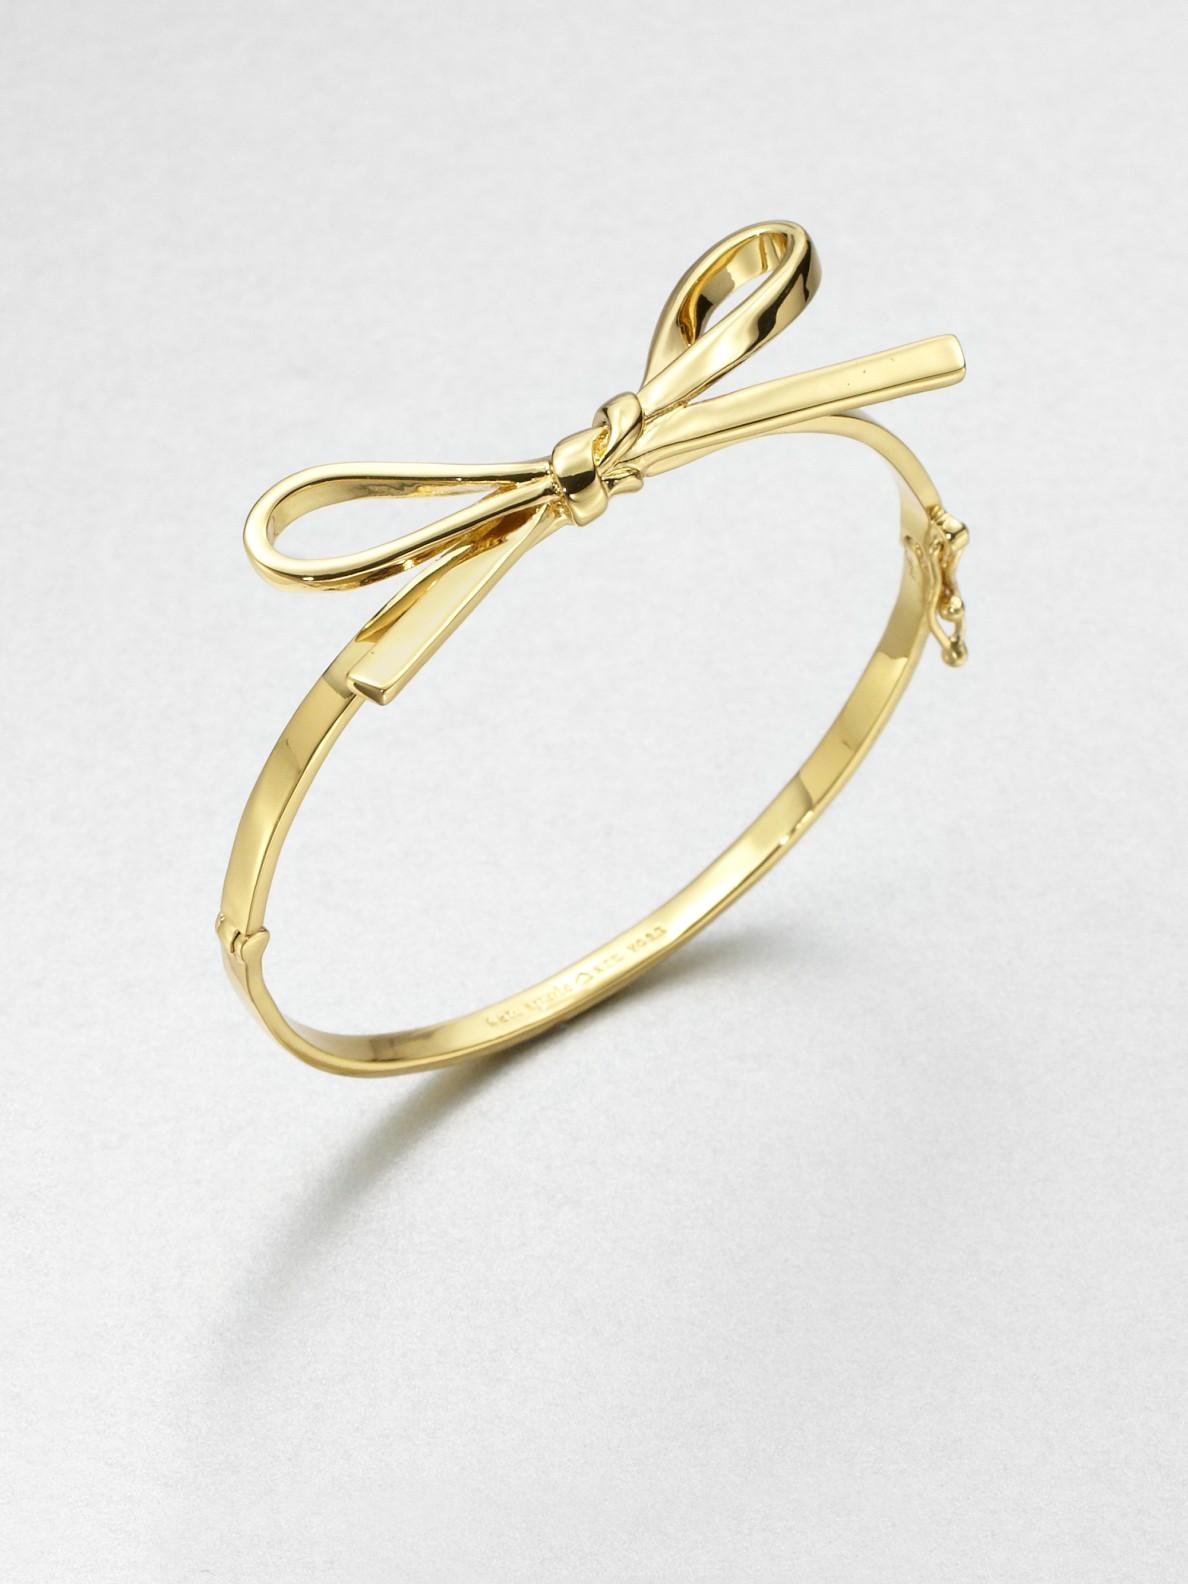 Lyst Kate Spade New York Skinny Bow Bangle Bracelet In